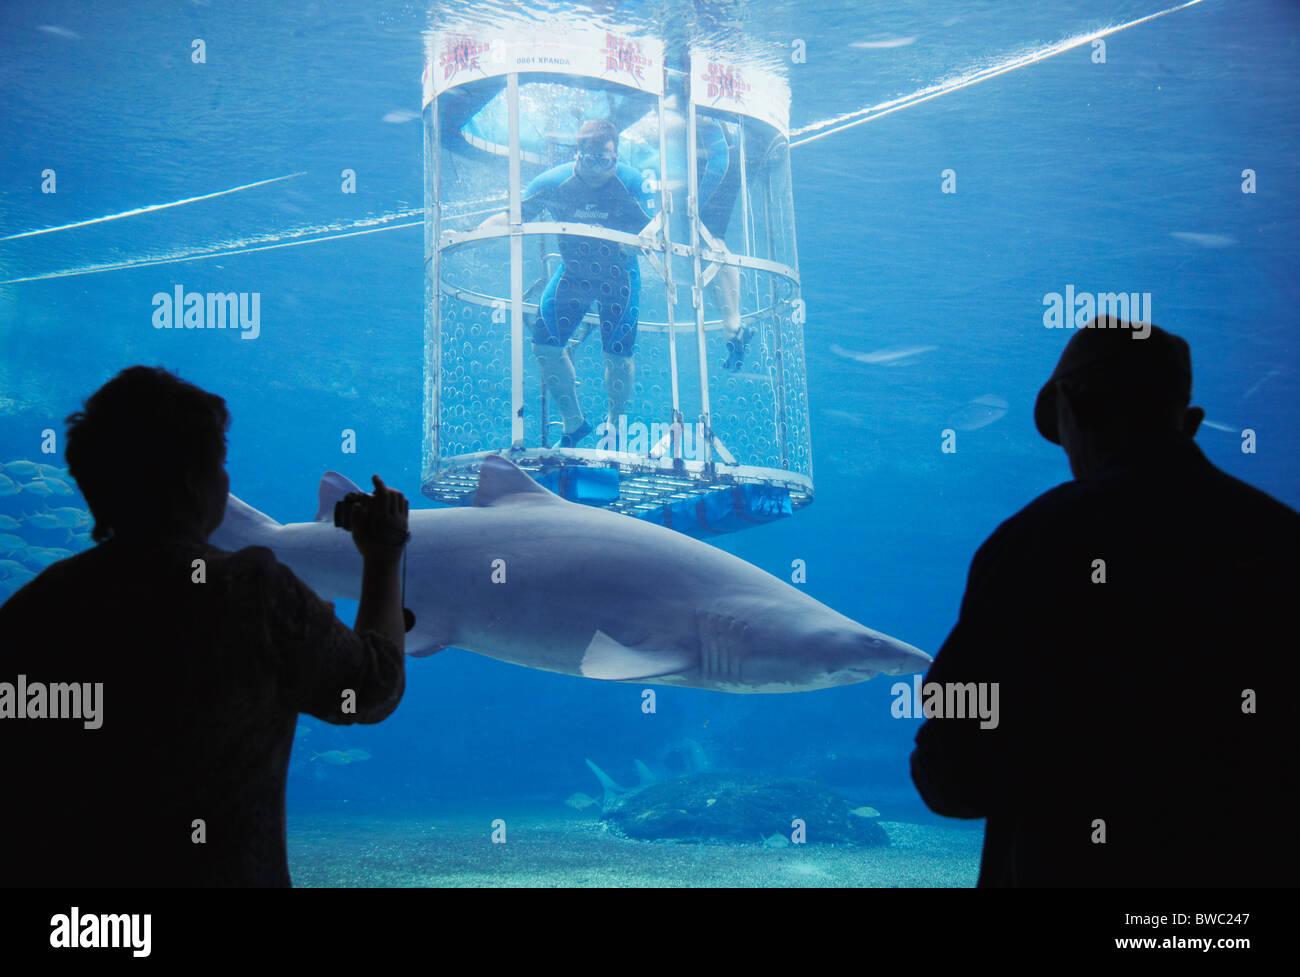 Woman filming people cage diving in shark aquarium at uShaka Marine World, Durban, KwaZulu-Natal, South Africa - Stock Image